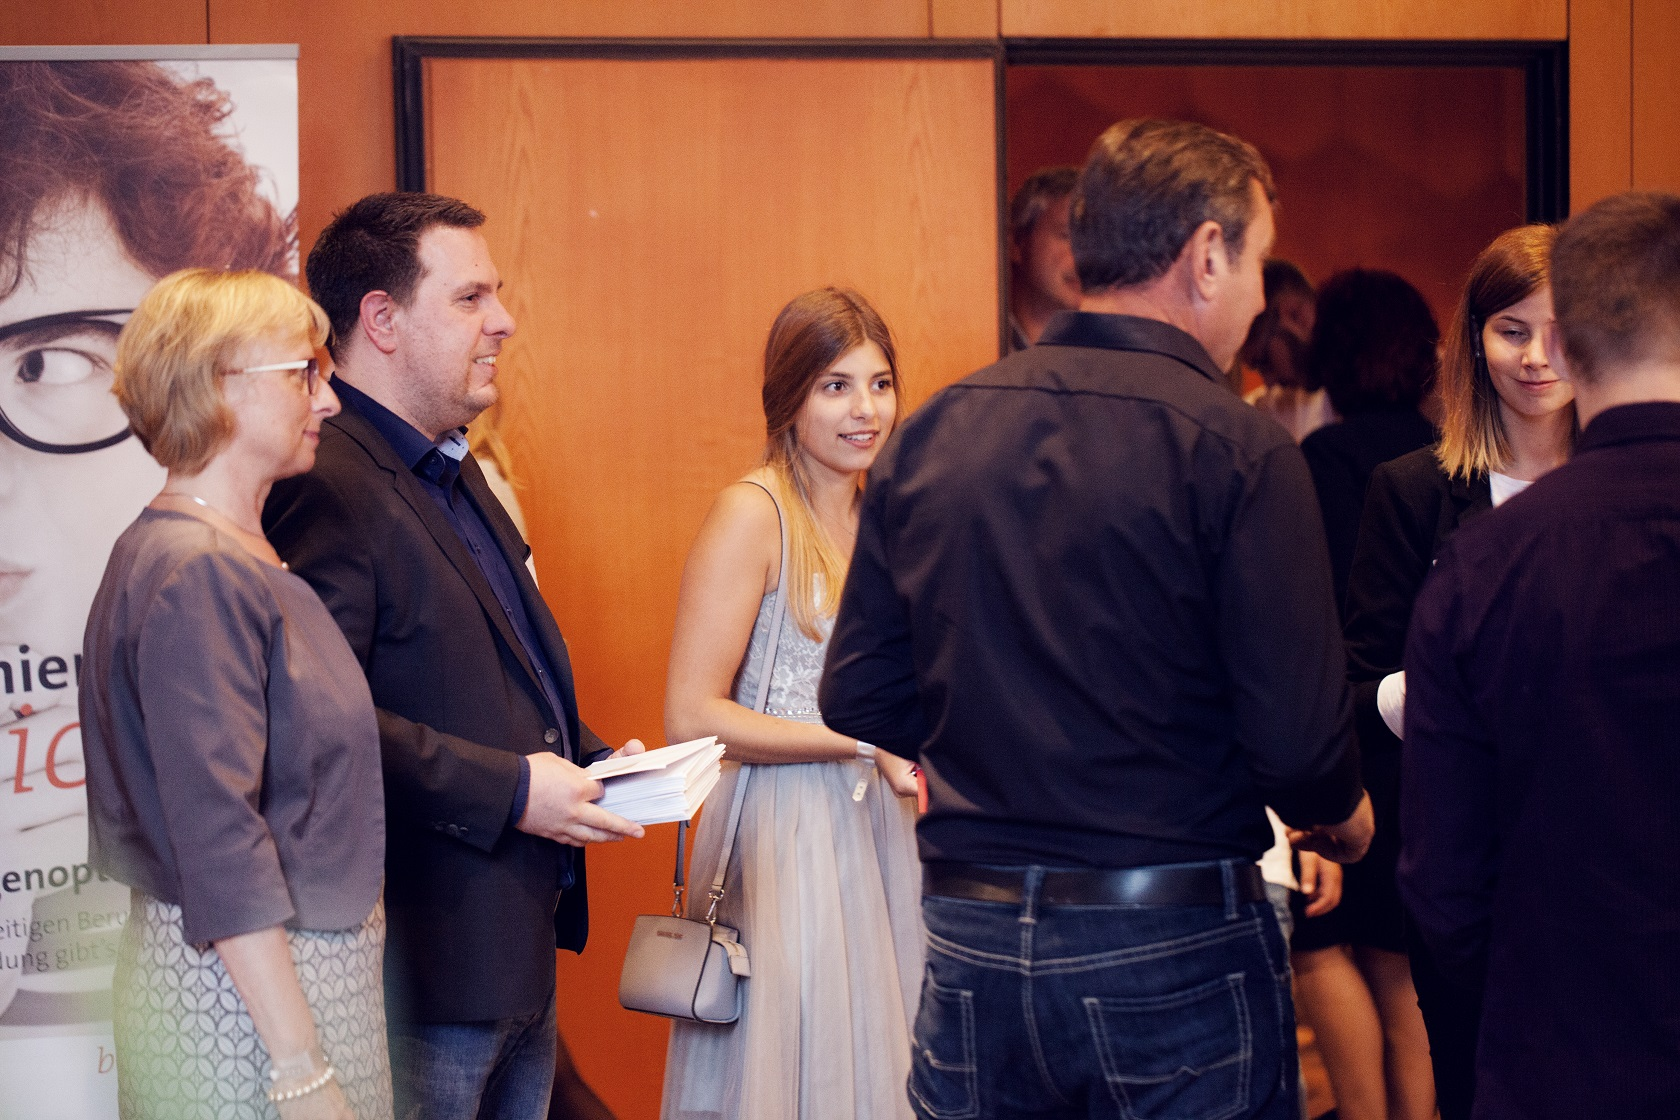 Freisprechungsfeier Bruchsal 2017 Saalöffnung